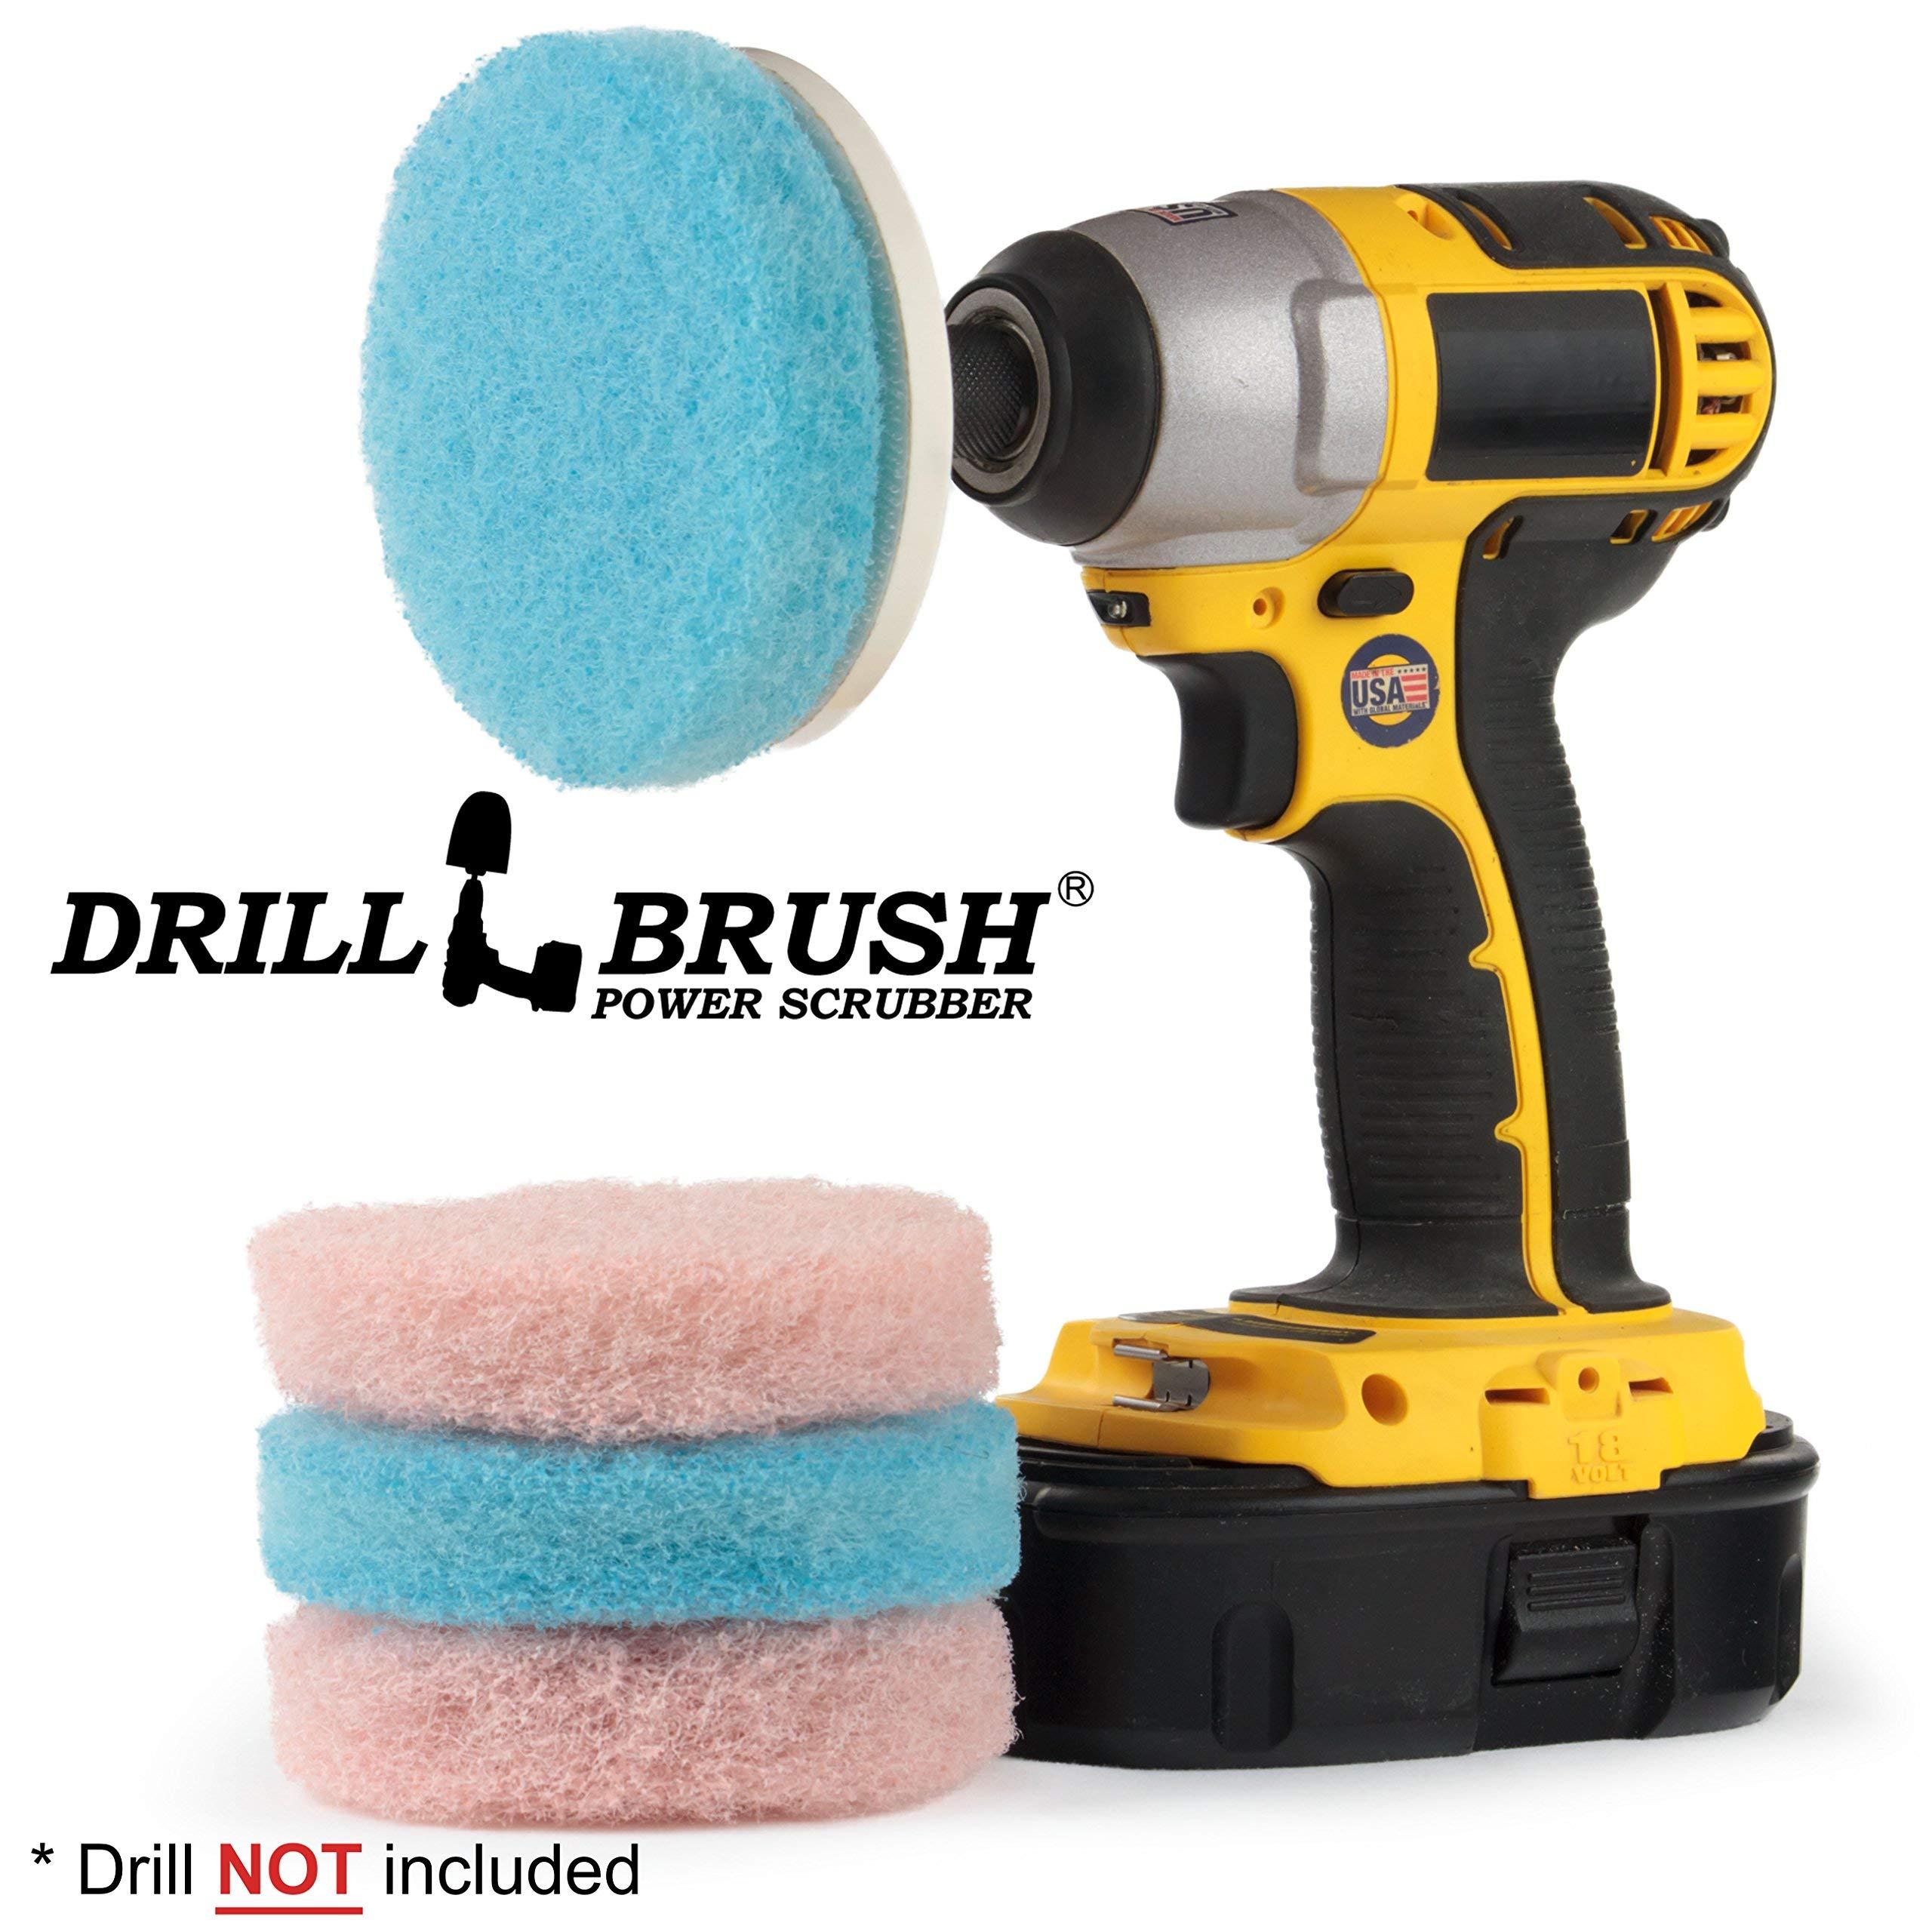 Drill Brush - Cleaning Supplies - Bathroom Accessories - Scrub Pads - Shower Cleaner - Bathtub - Bath Mat – Bathroom Sink - Scrubber - Hard Water Stain Remover - Glass Cleaner - Shower Door Cleaner